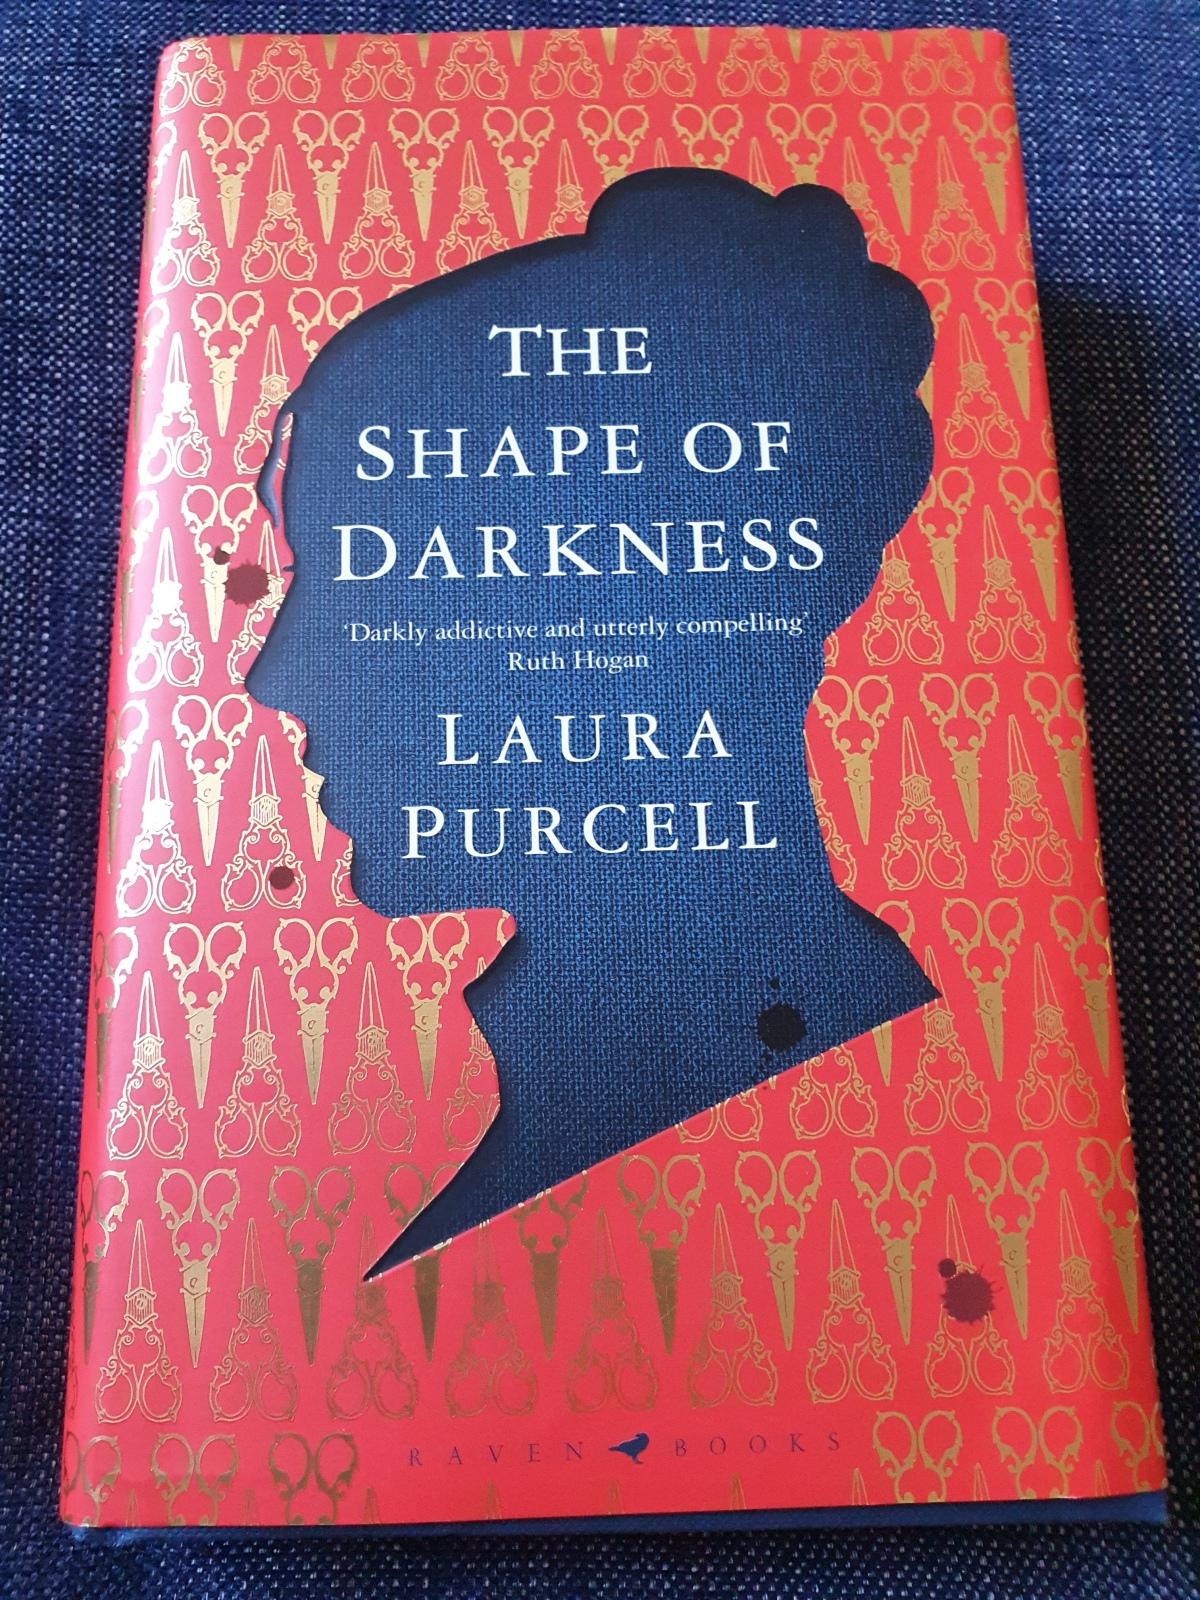 Boktips: The Shape of Darkness av LauraPurcell